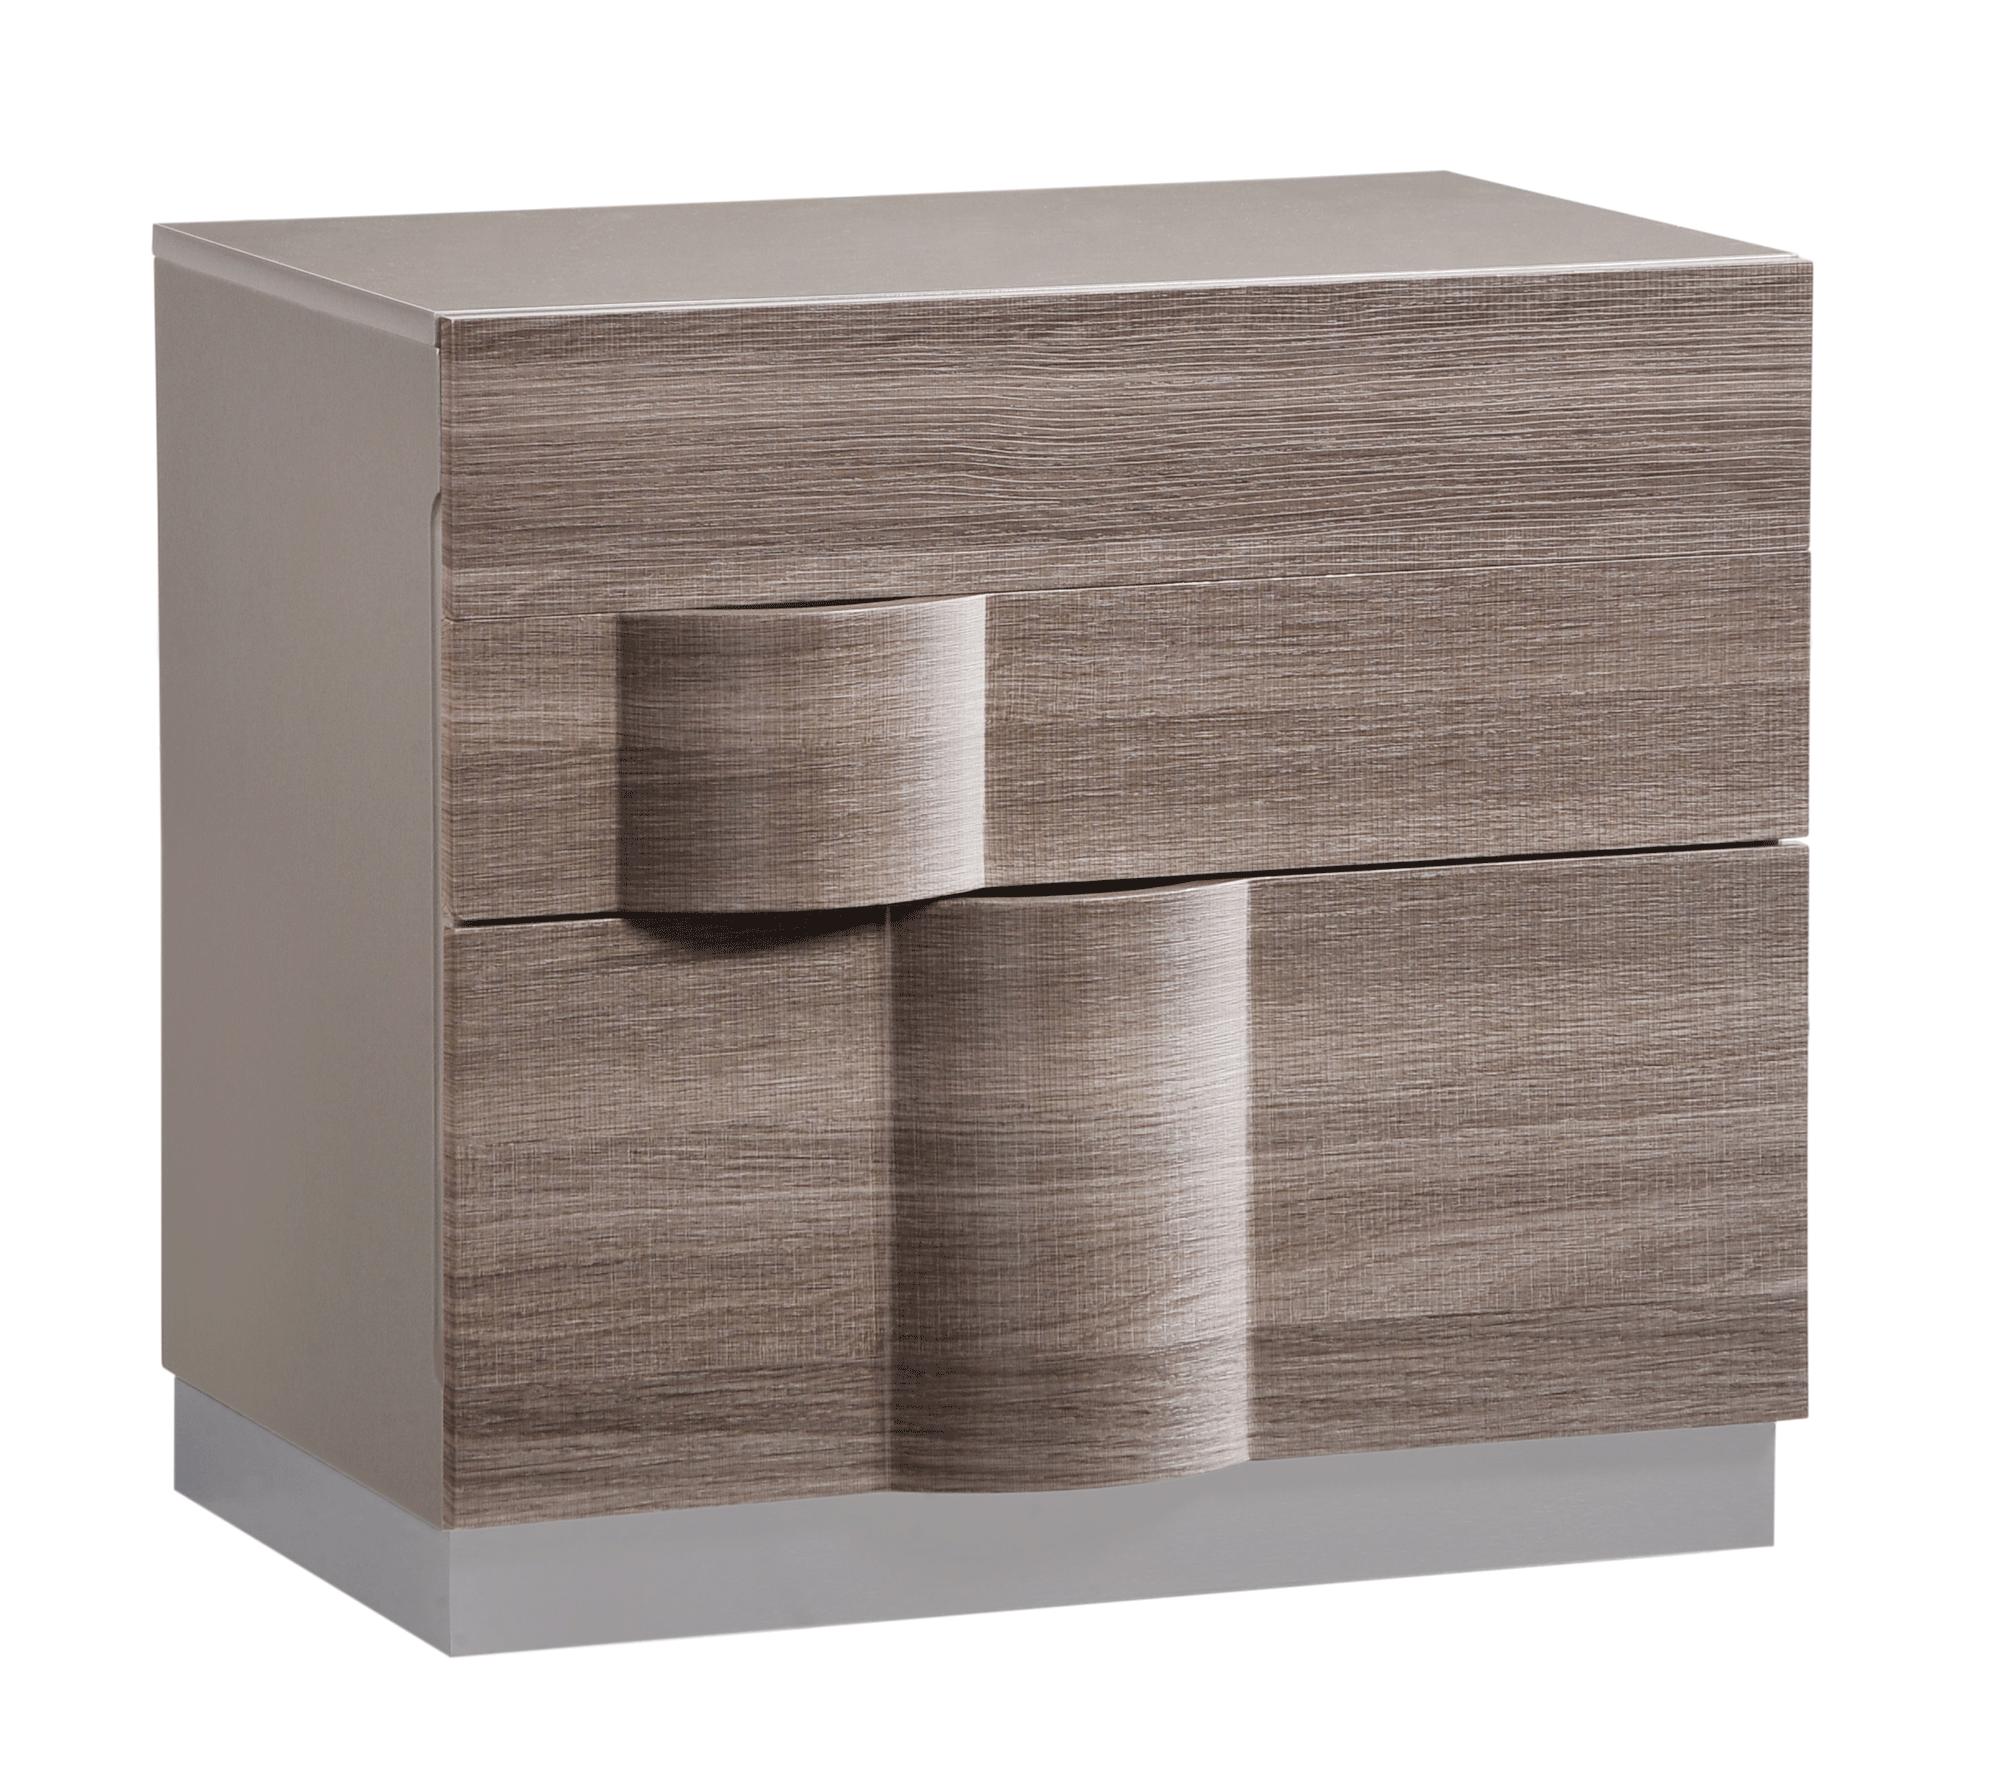 Adel Grey Glossy & Zebra Wood Bedroom Set by Global Furniture